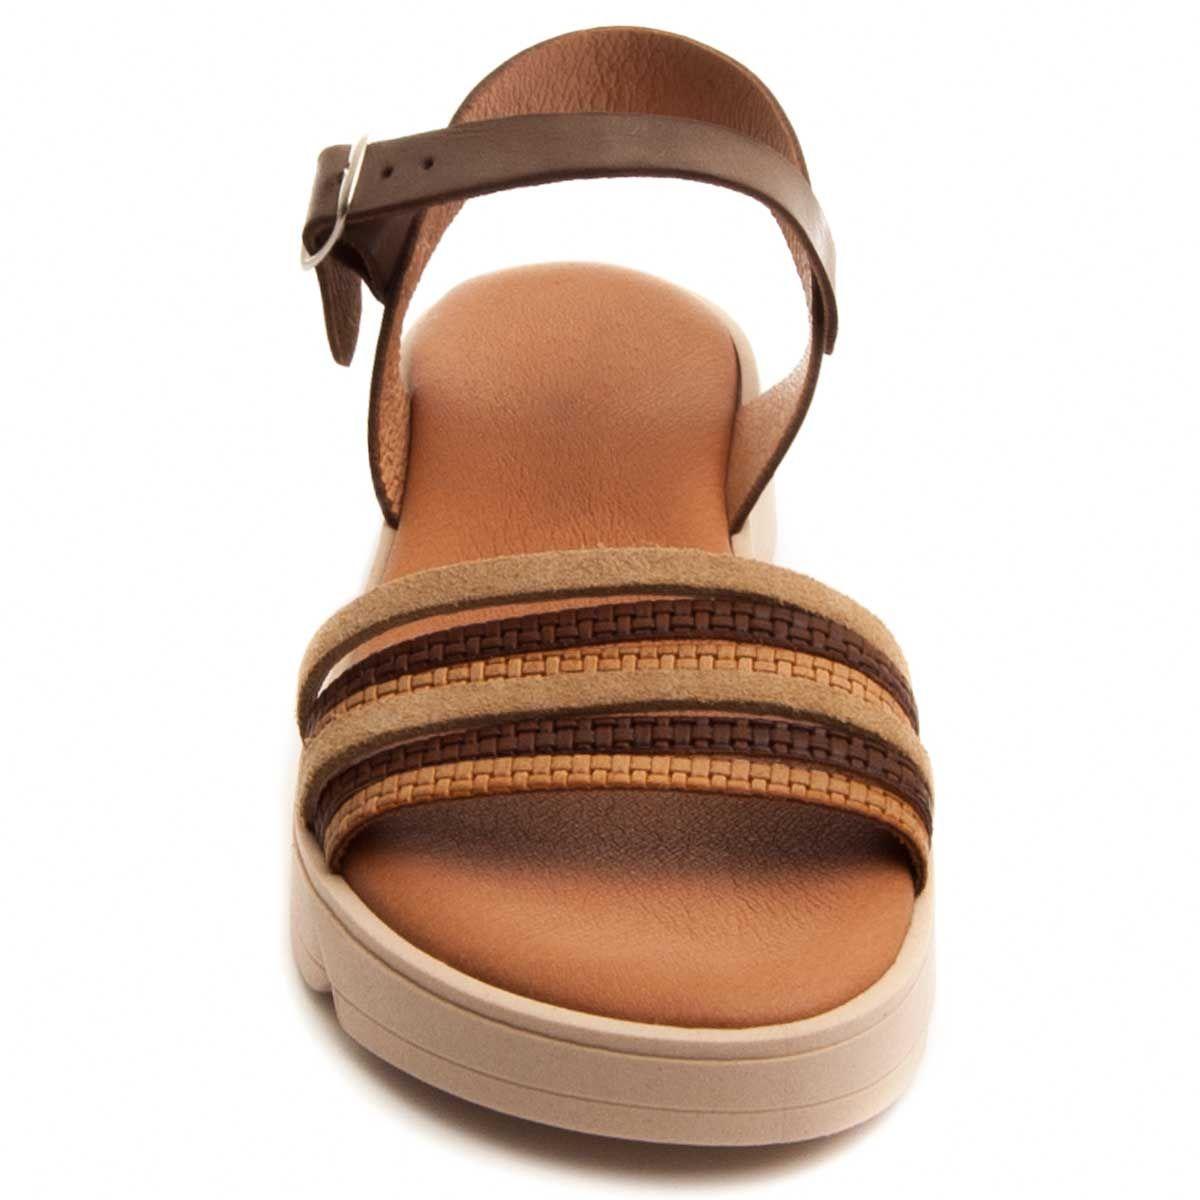 Purapiel Strappy Sandal in Brown